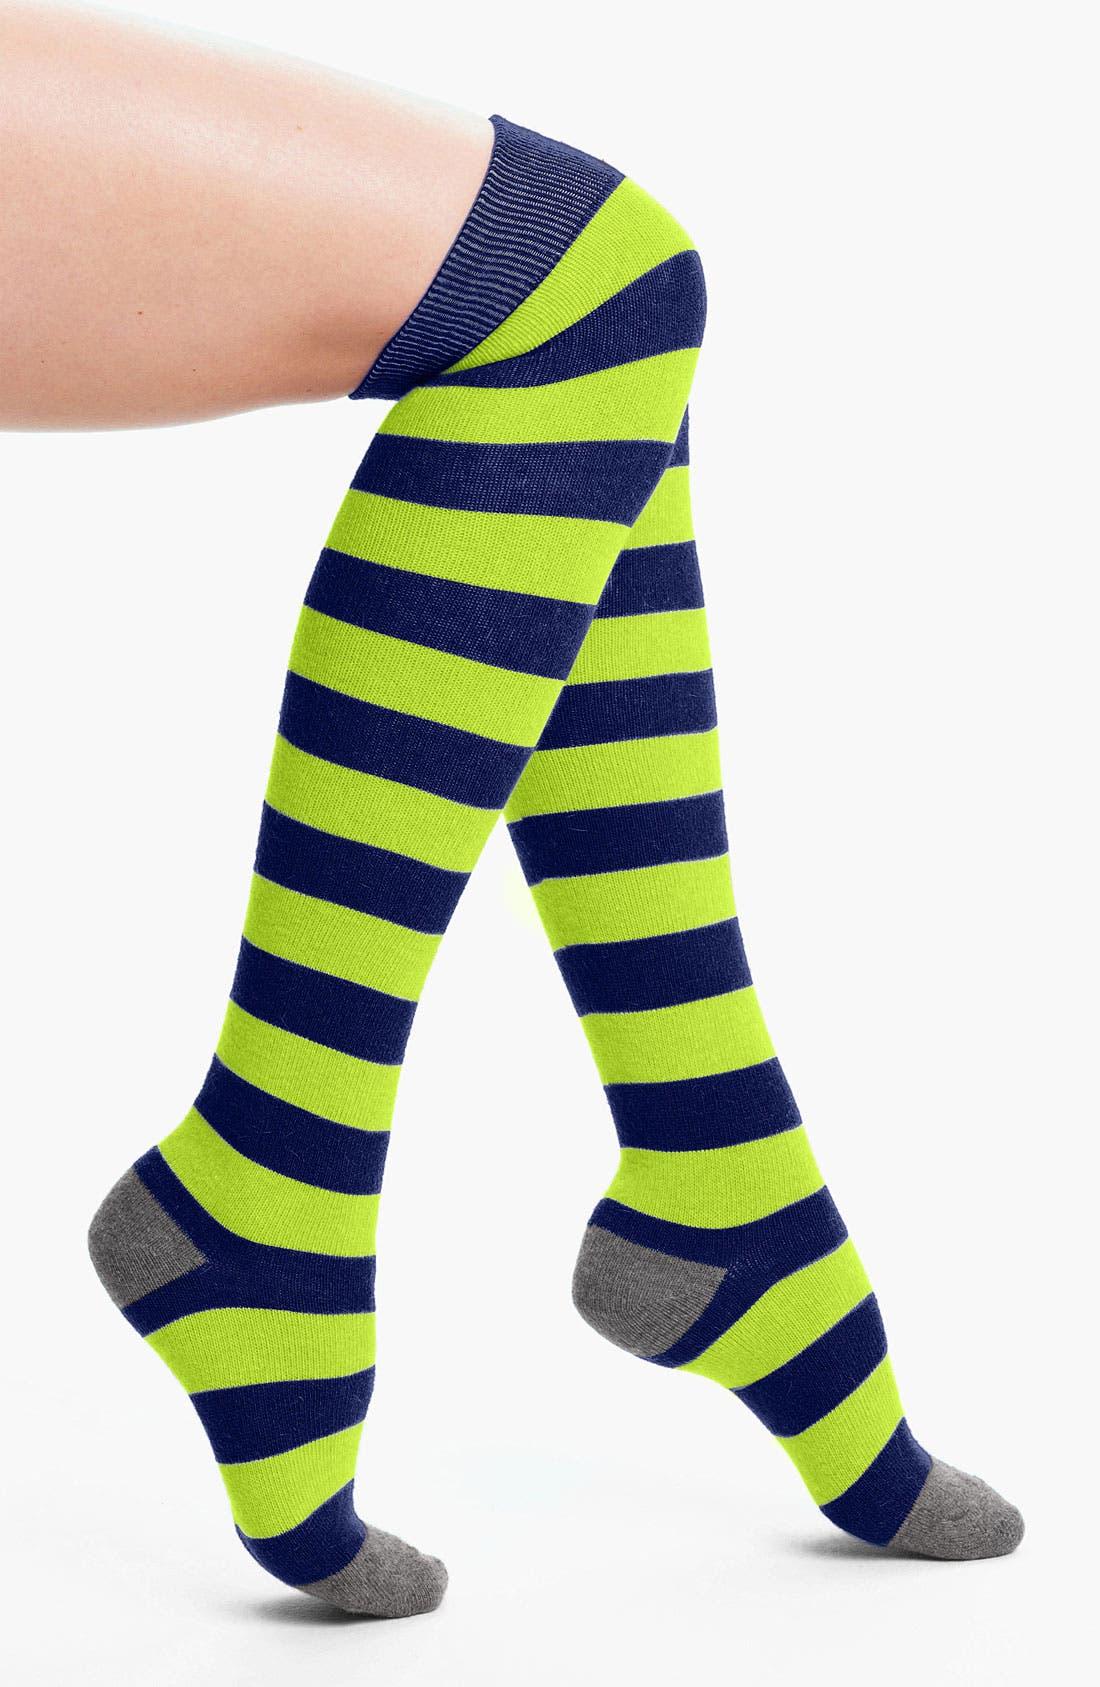 Main Image - Make + Model 'Candy Stripe' Over the Knee Socks